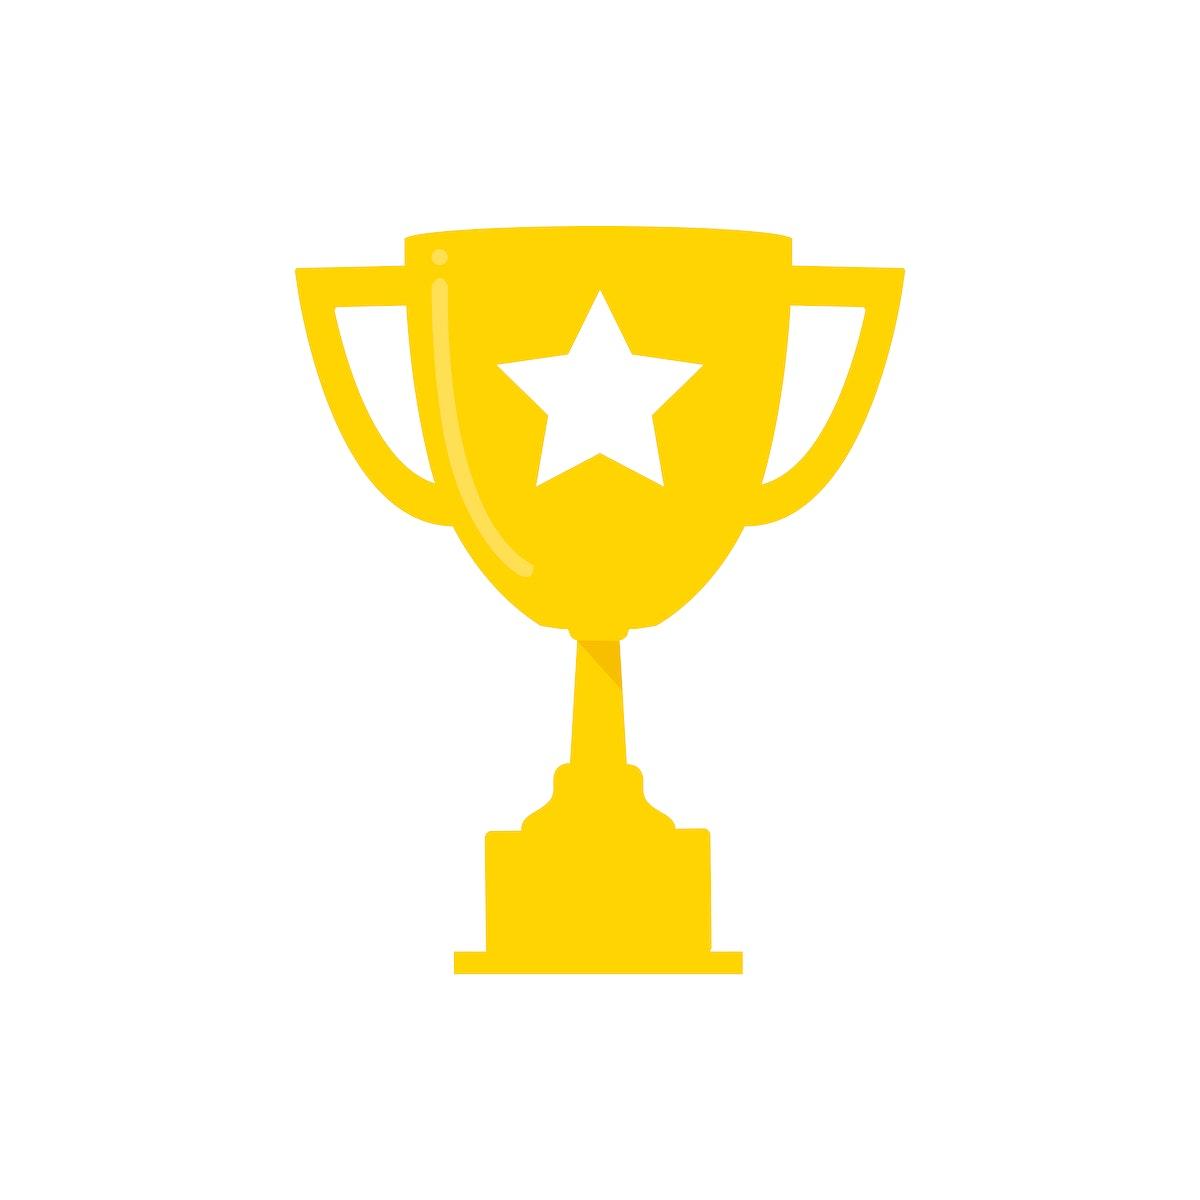 Golden champion cup graphic illustration